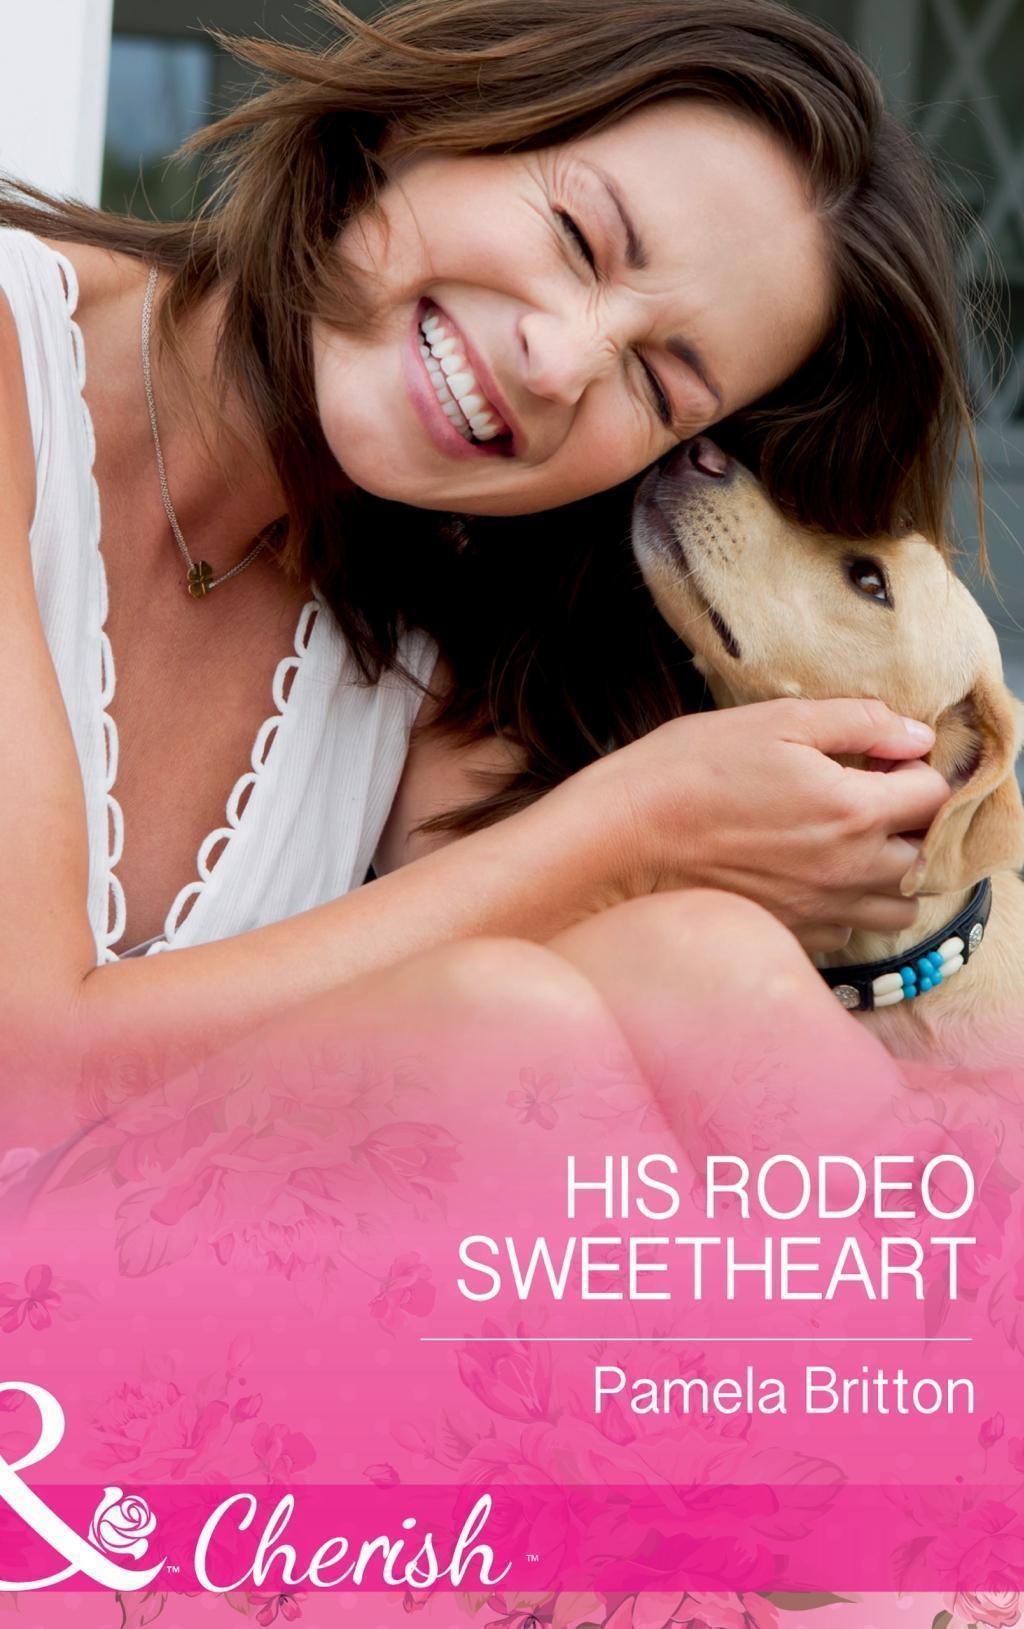 His Rodeo Sweetheart (Mills & Boon Cherish) (Cowboys in Uniform, Book 2)